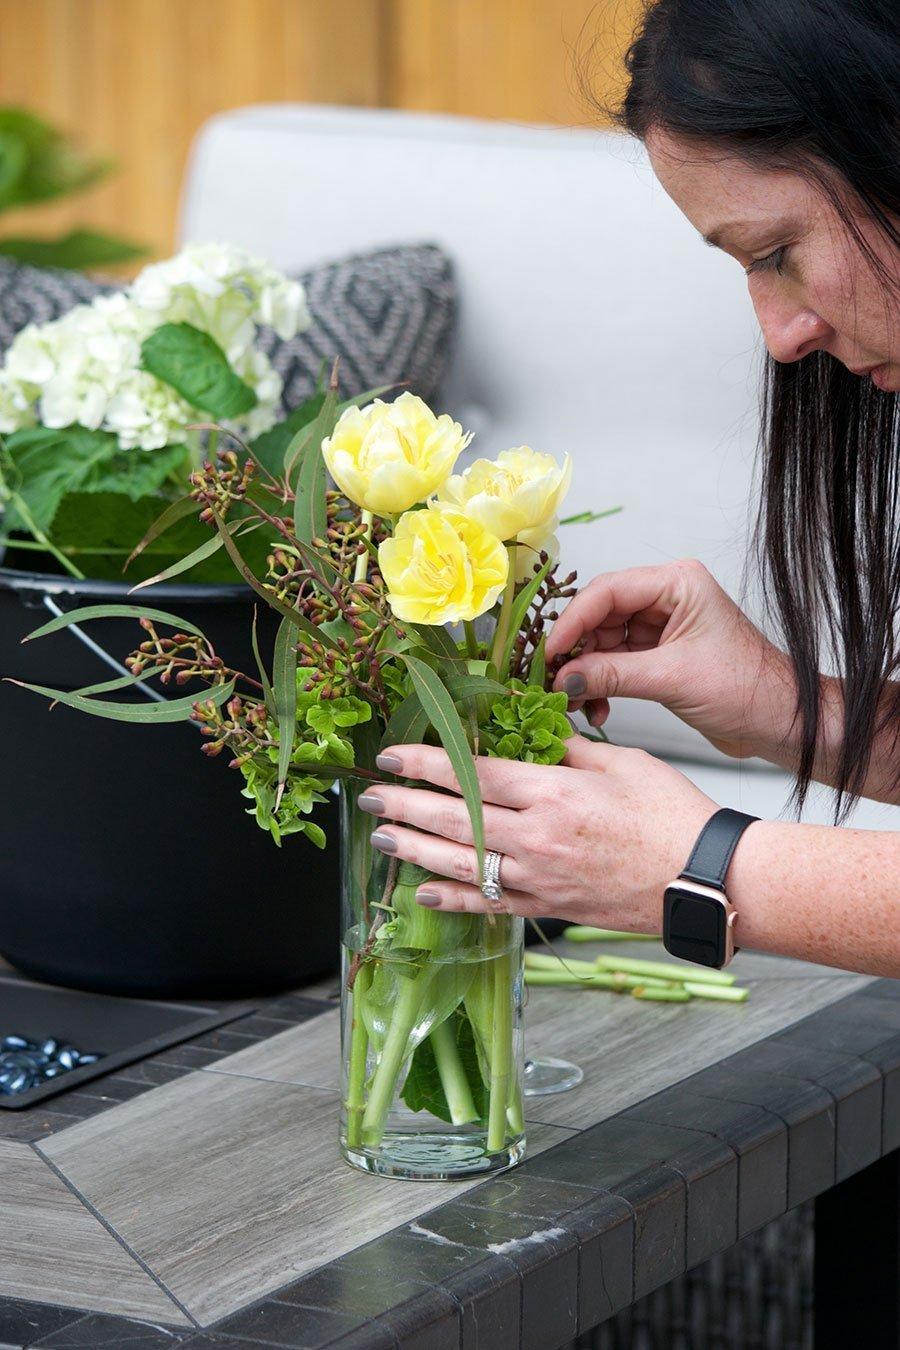 woman working on yellow flower arrangement